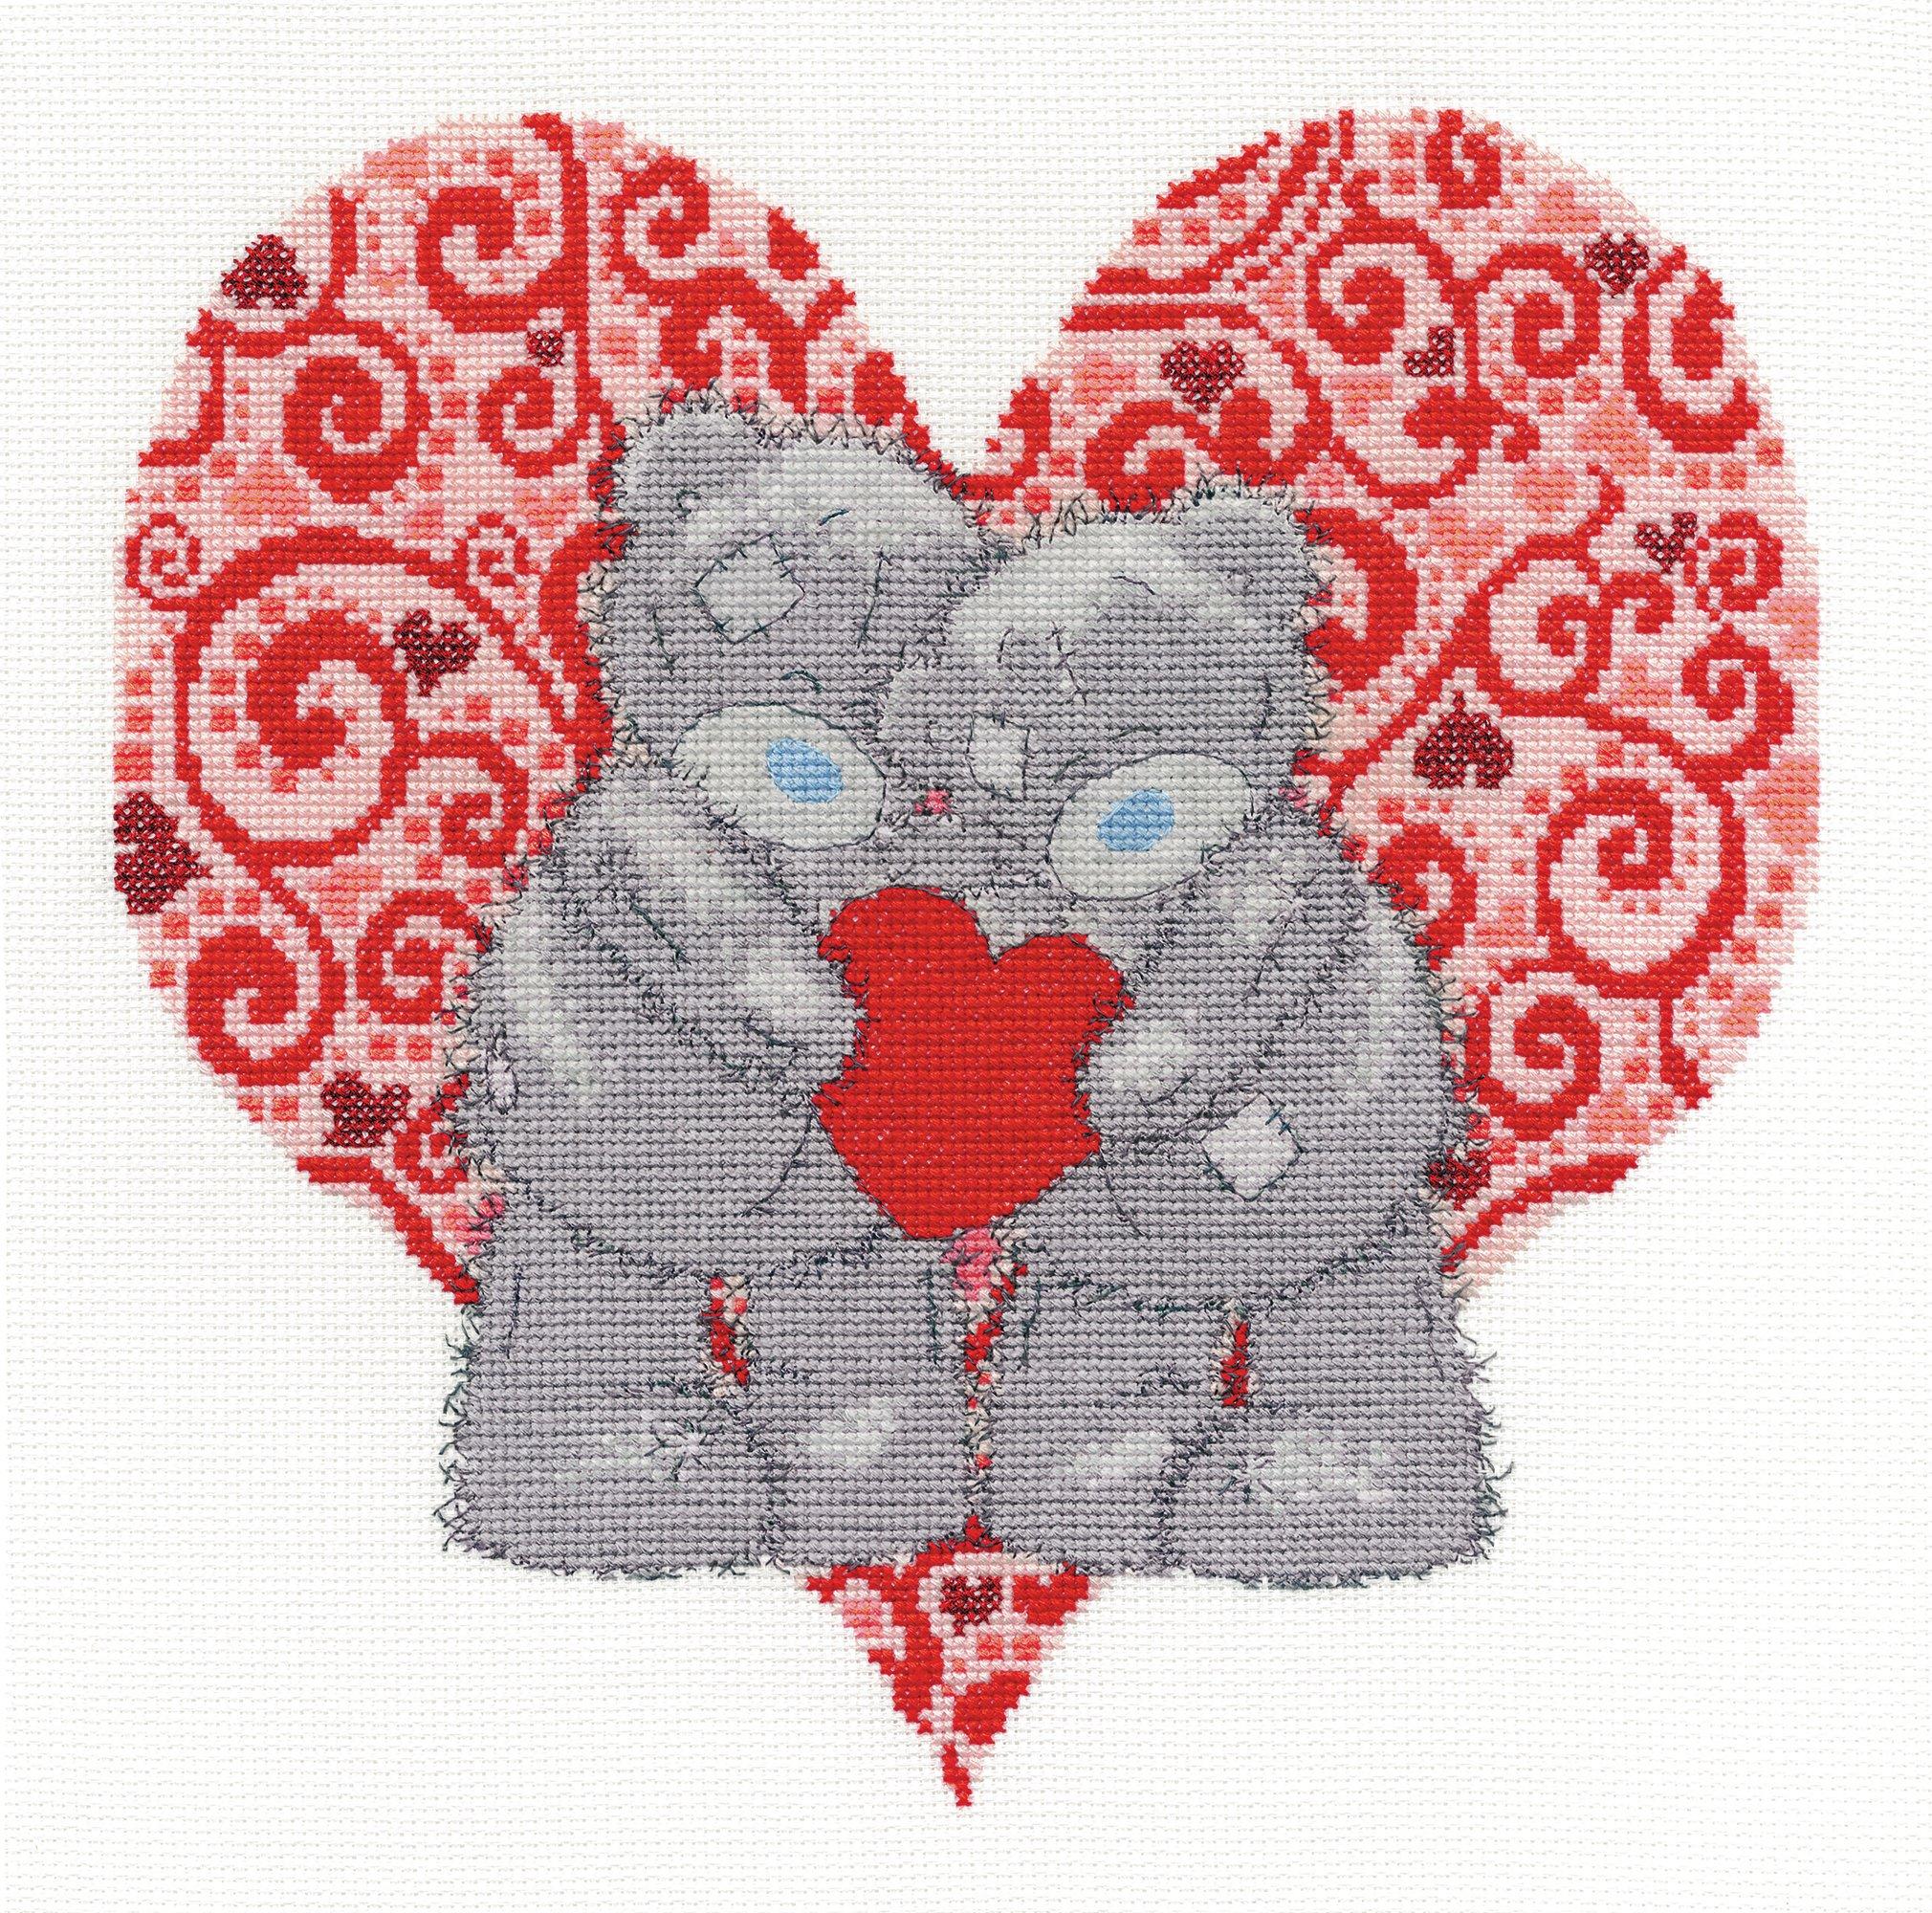 me-to-you-love-bears-cross-stitch-kit